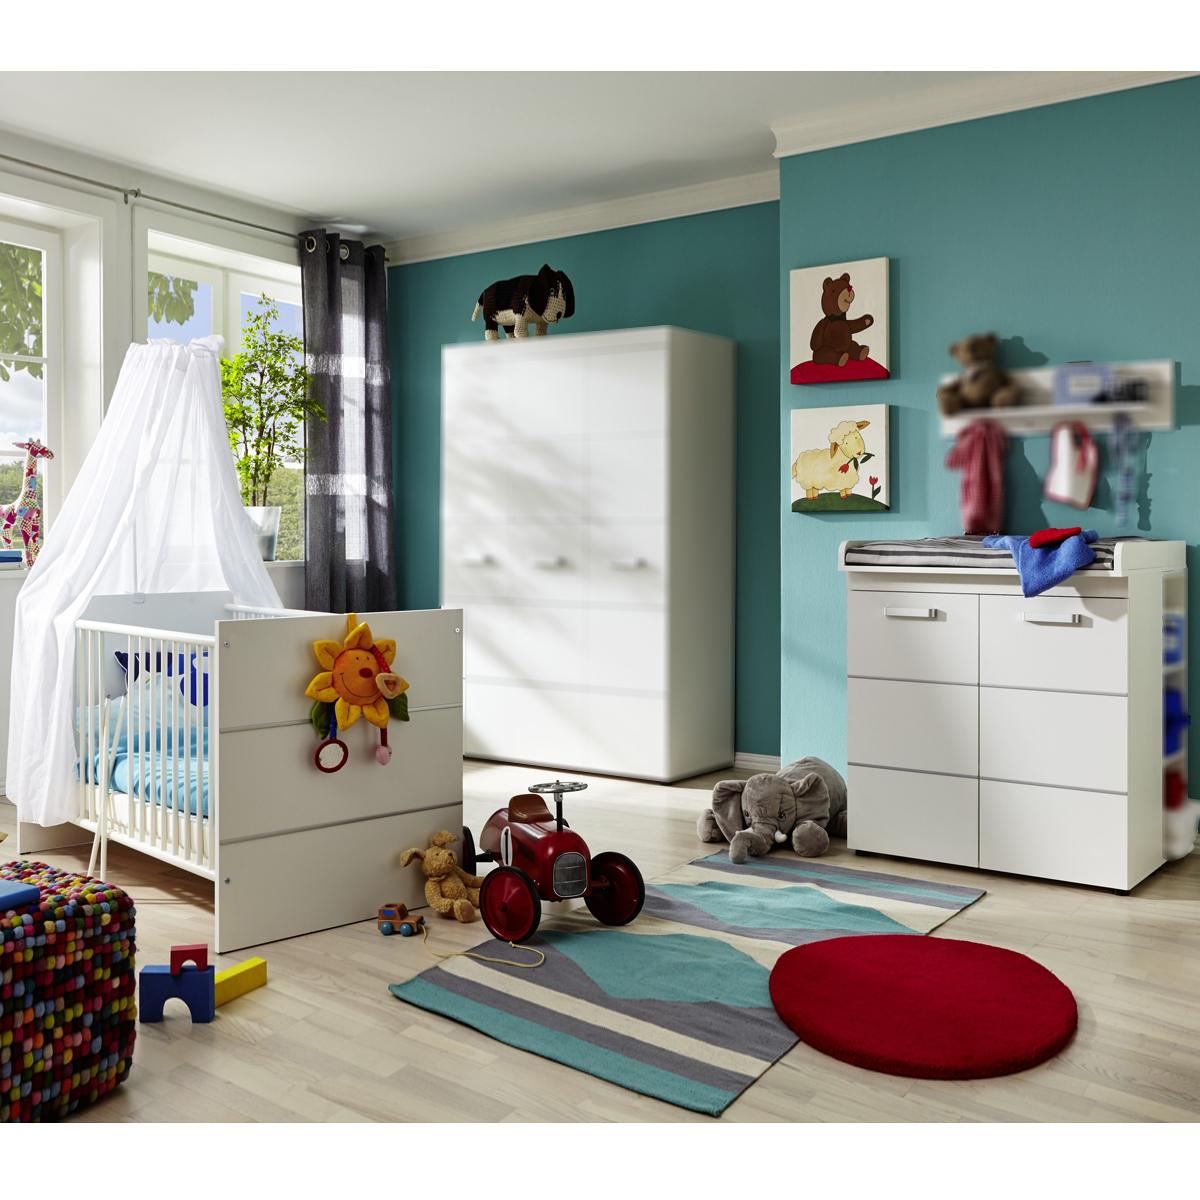 babyzimmer leony set 2 teilig babybett wickelkommode in wei. Black Bedroom Furniture Sets. Home Design Ideas